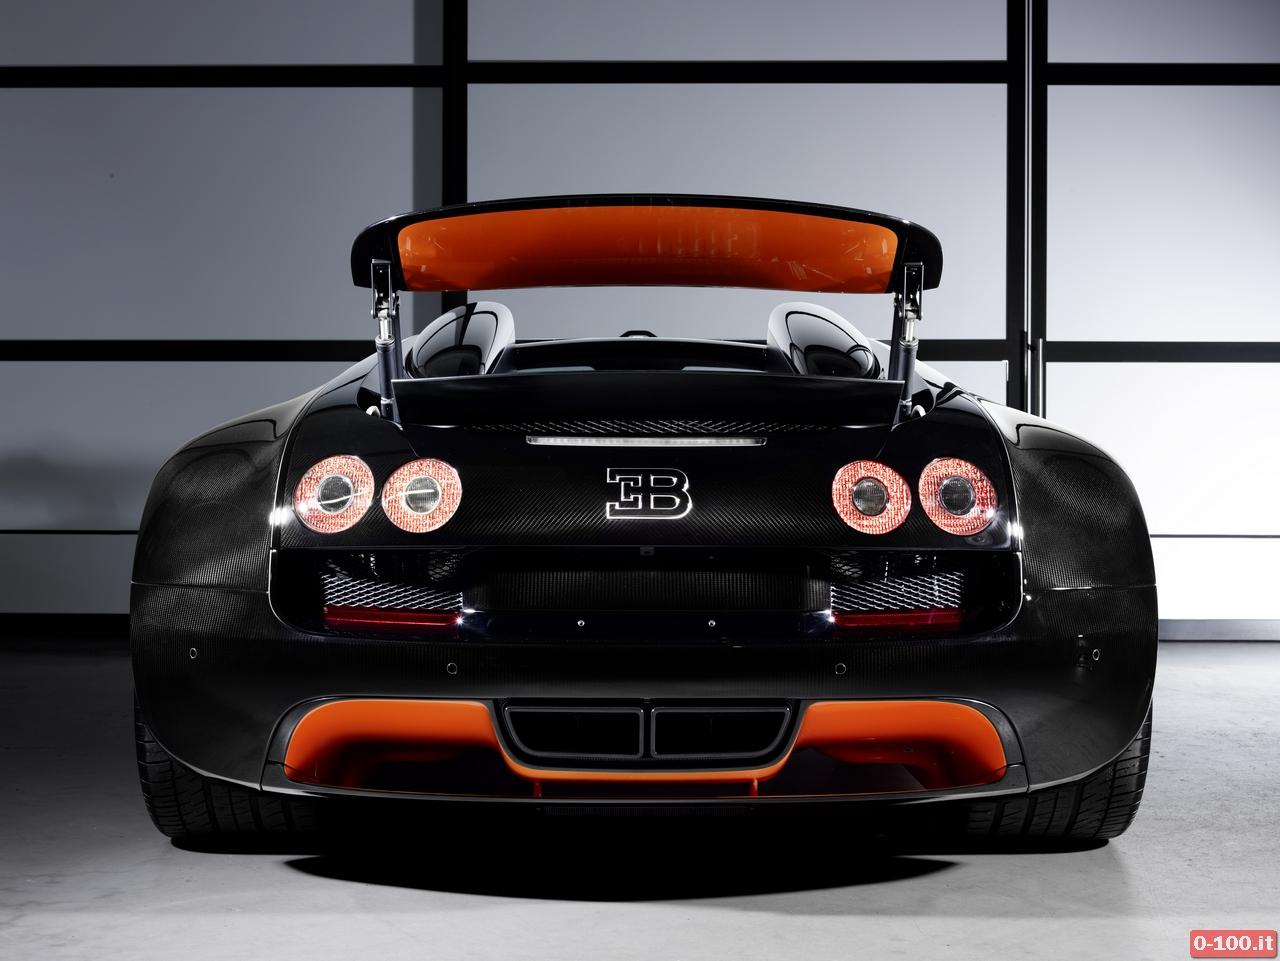 bugatti-veyron-16-4-grand-sport-vitesse-debutto-a-shanghai_0-100_4